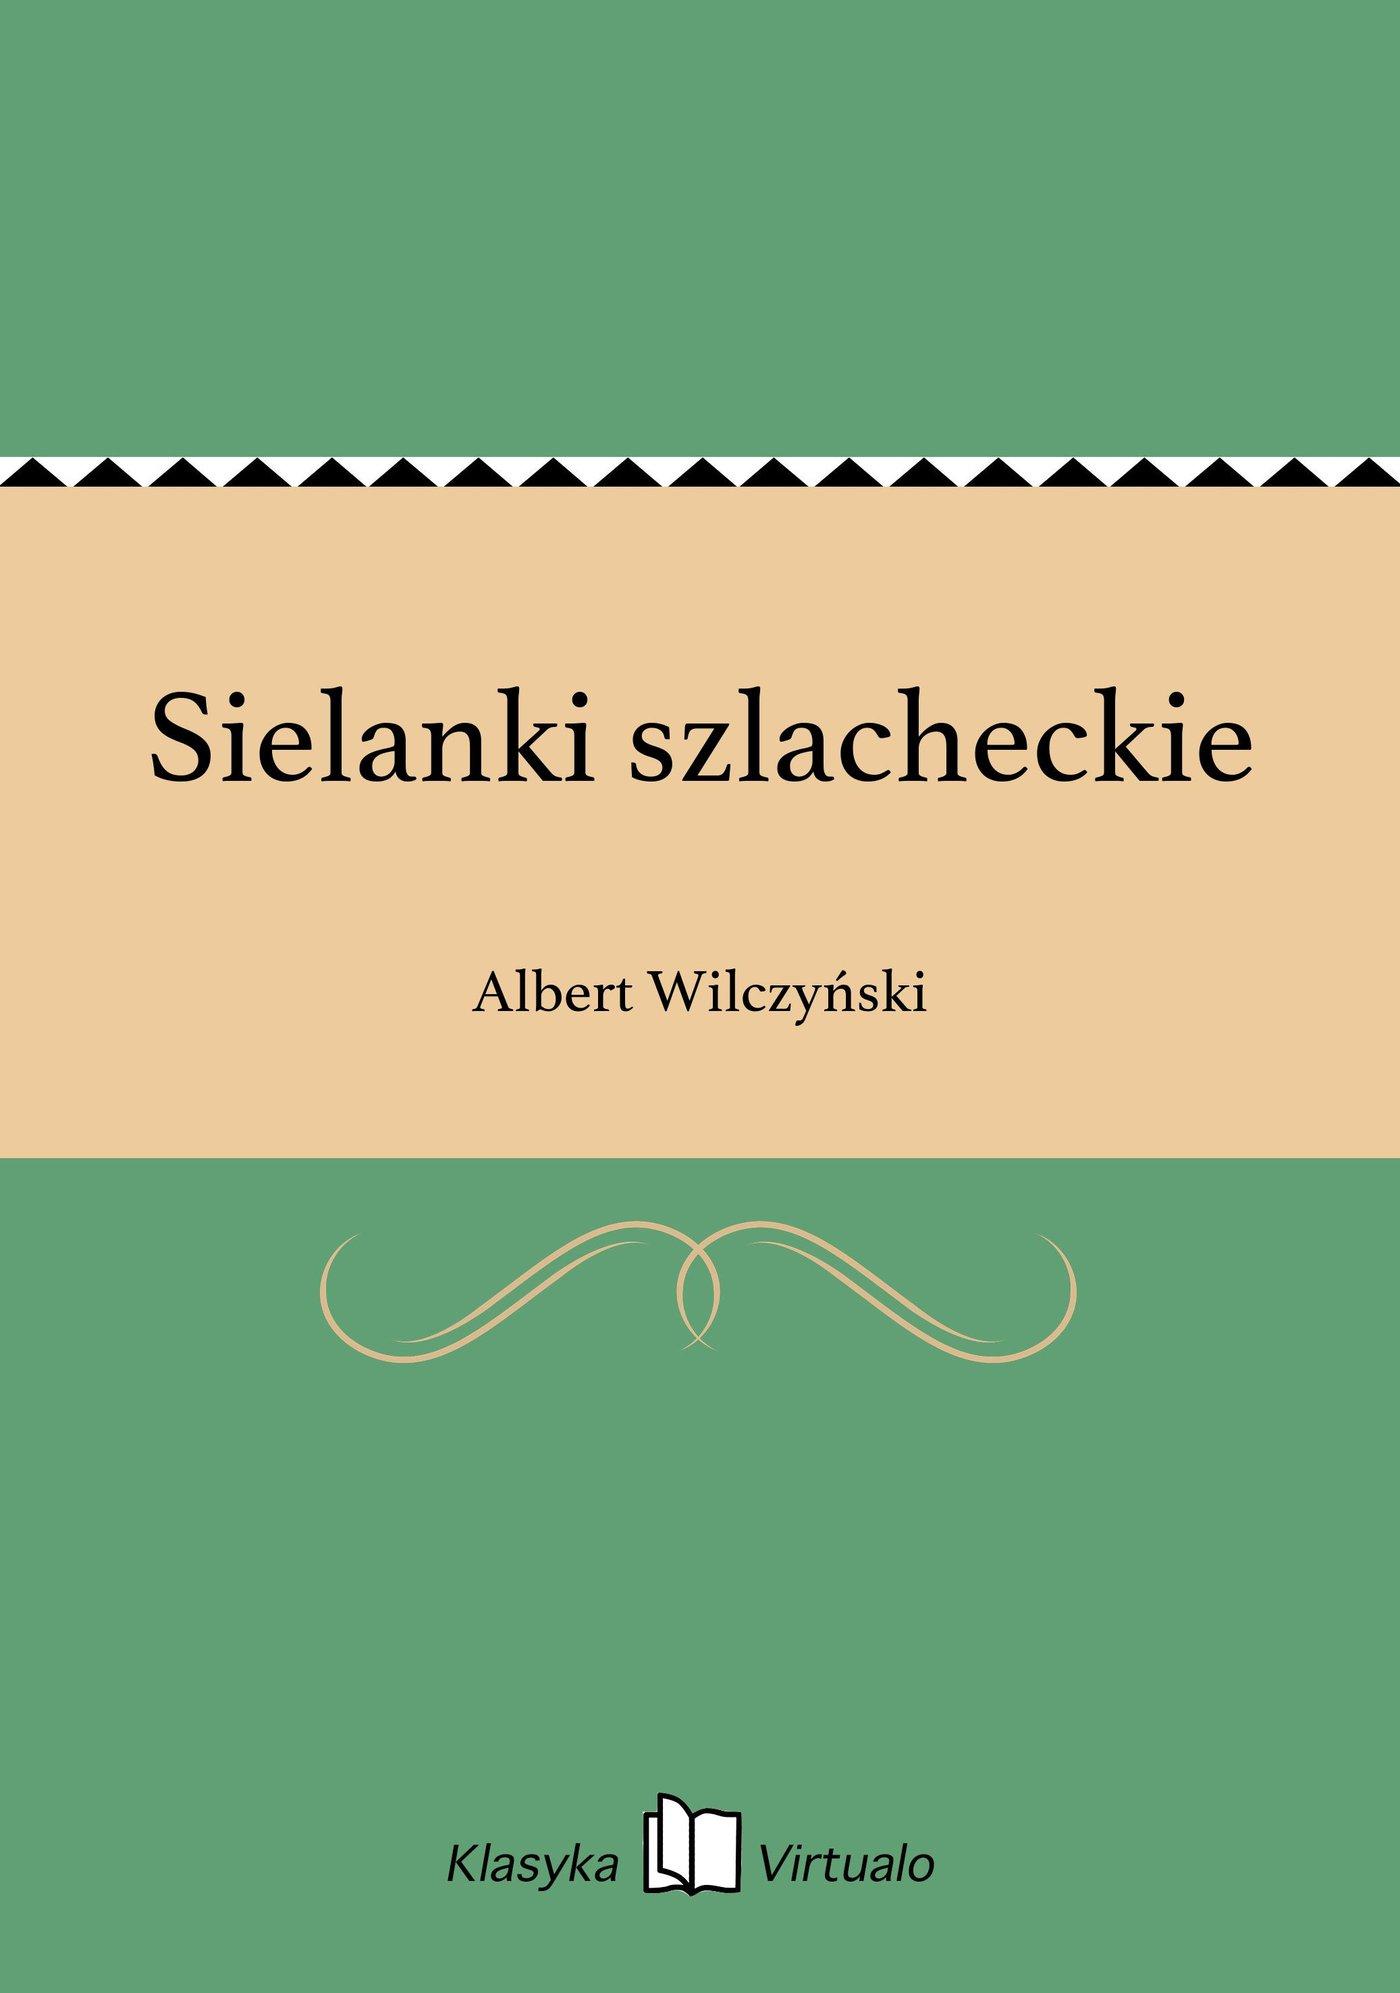 Sielanki szlacheckie - Ebook (Książka EPUB) do pobrania w formacie EPUB